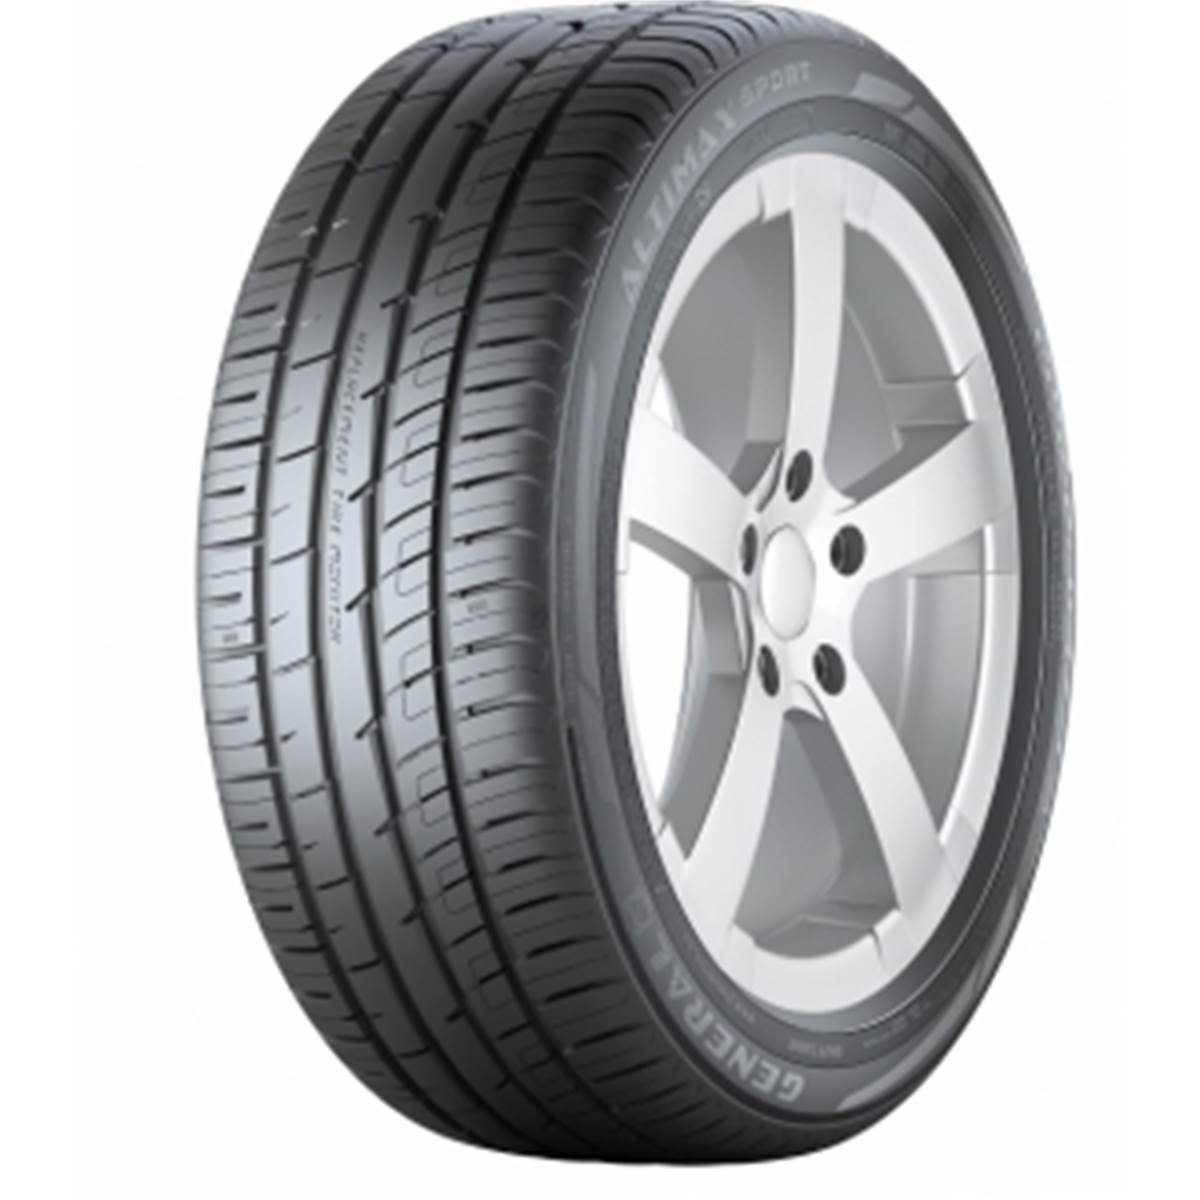 Pneu General Tire 245/40R18 97Y Altimax Sport XL